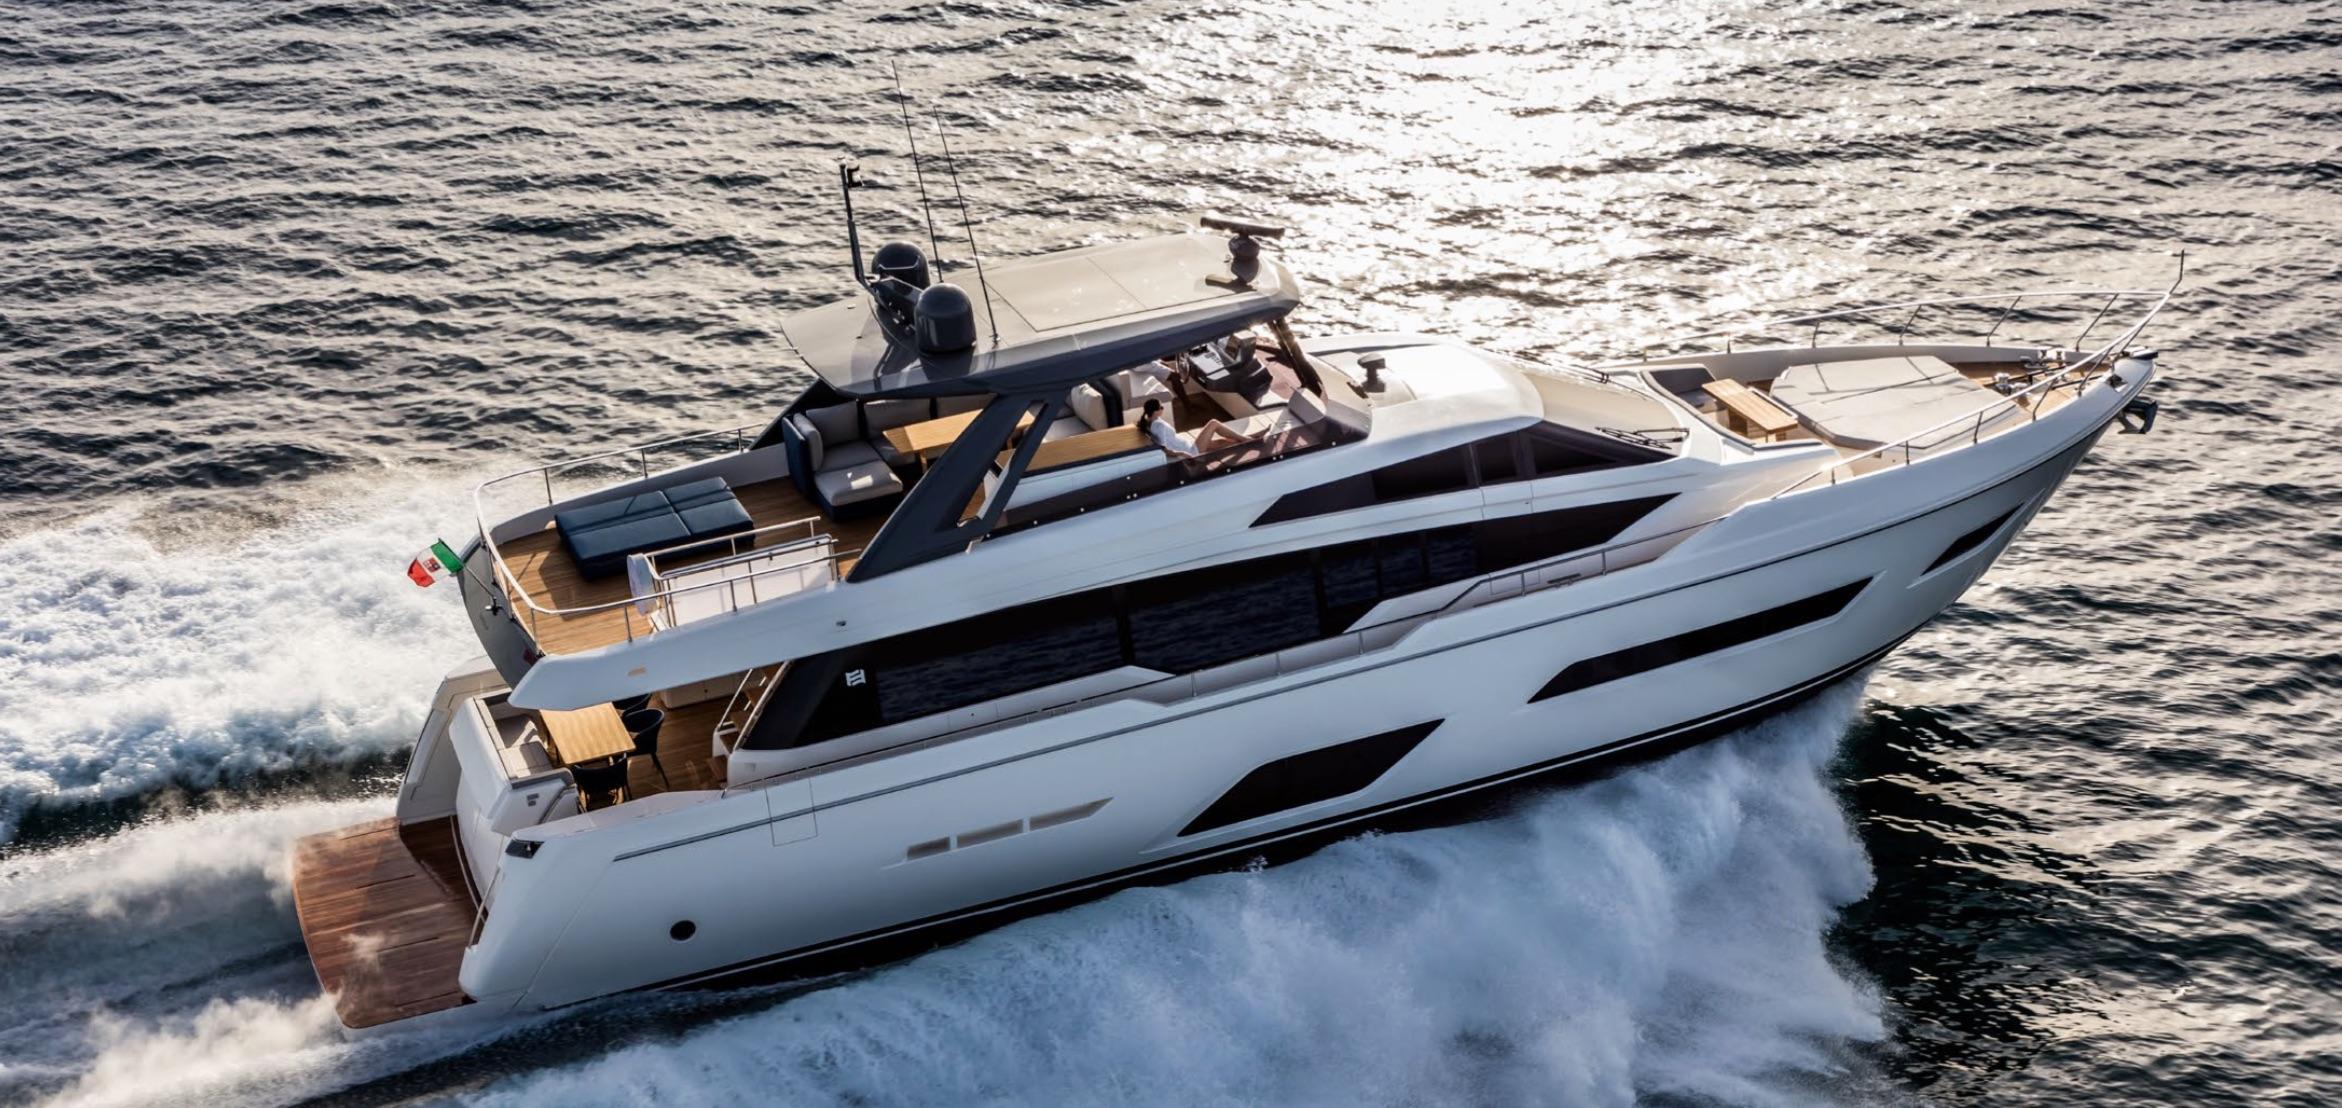 new ferretti 780 - 2018 - ita yachts canada